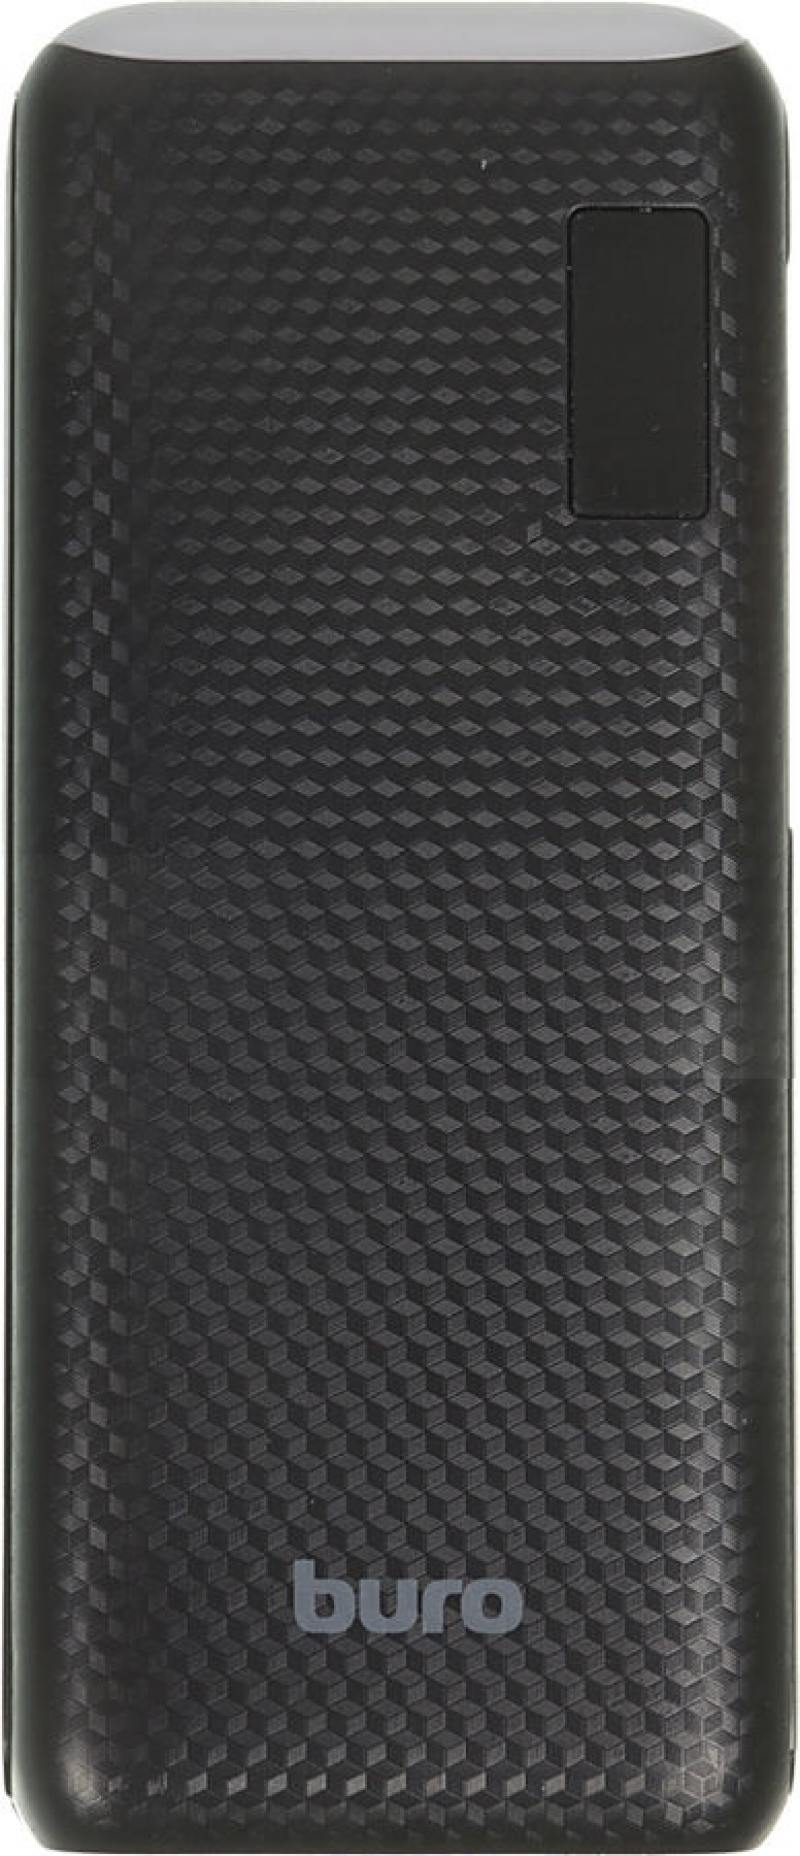 Фото - Портативное зарядное устройство Buro RC-12750B 12750мАч черный внешний аккумулятор для портативных устройств buro rc 12750b 12750mah черный rc 12750b